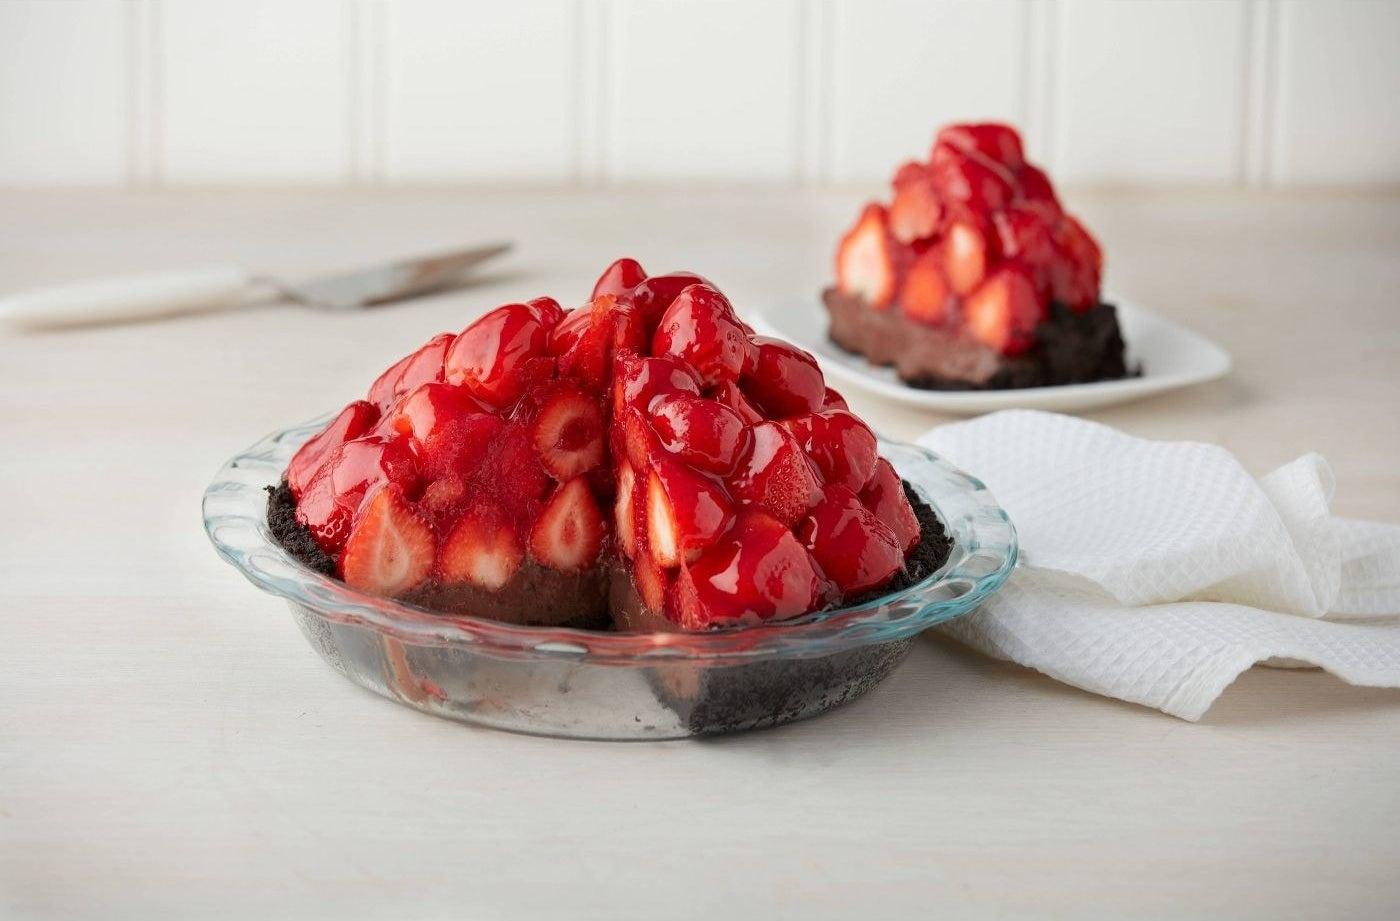 A glass pie plate with a strawberry pie